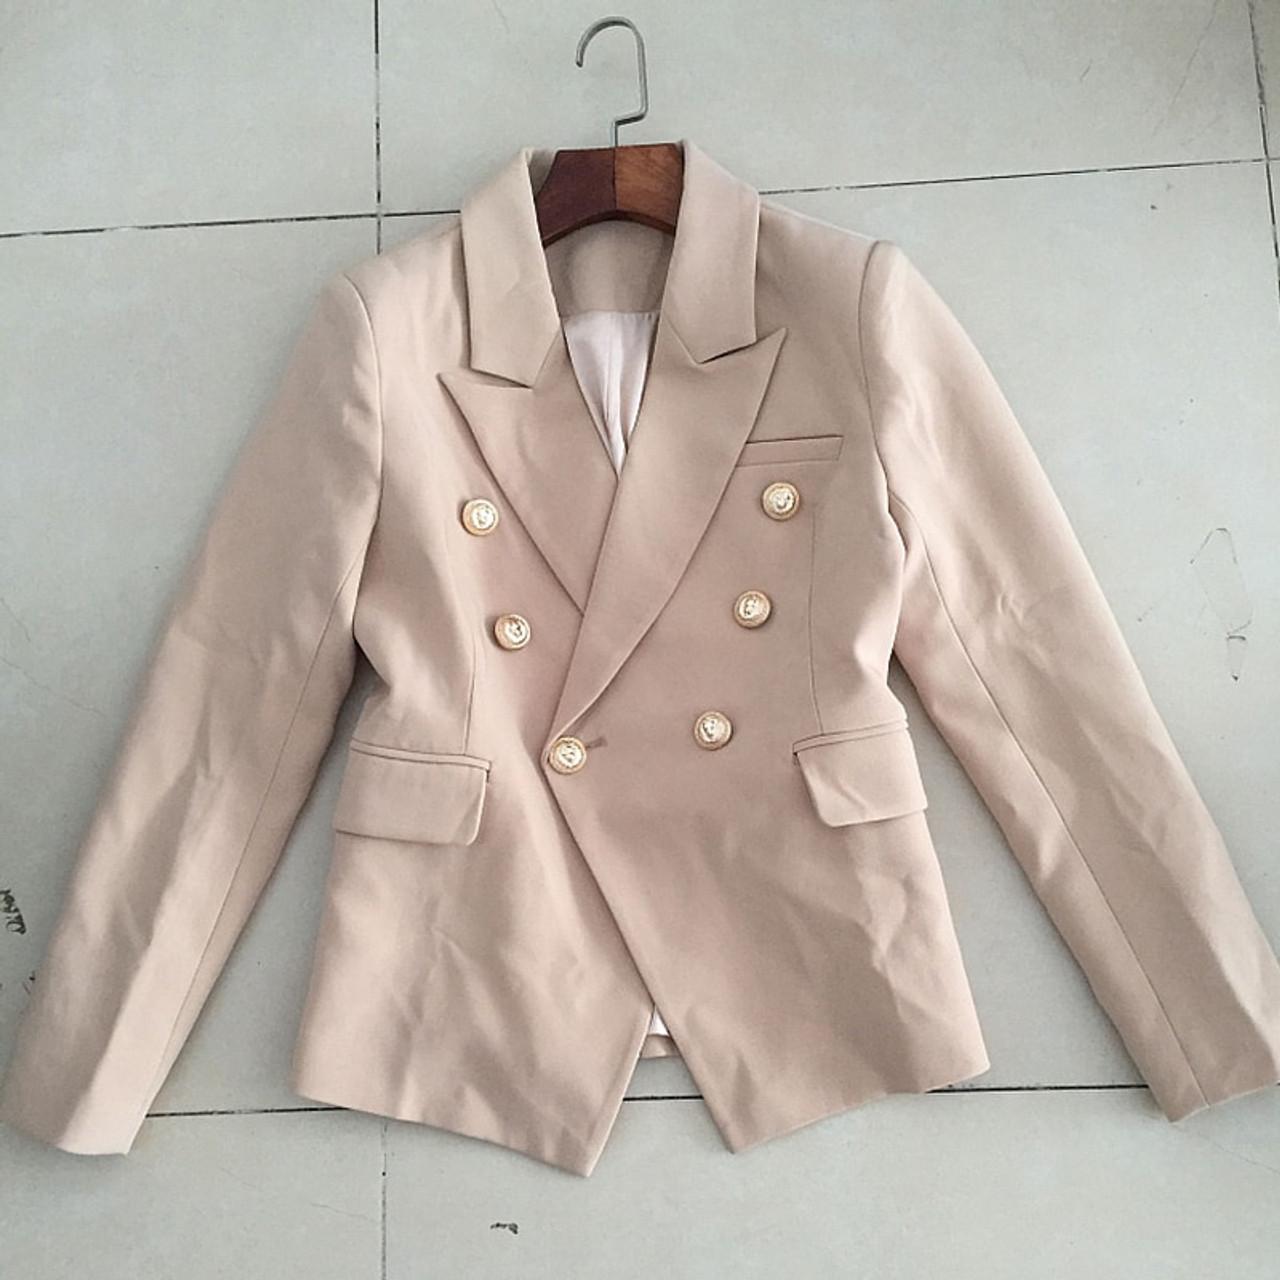 NEW Women Long Sleeve Double Breasted Metal Buttons Blazer Jacket outwear